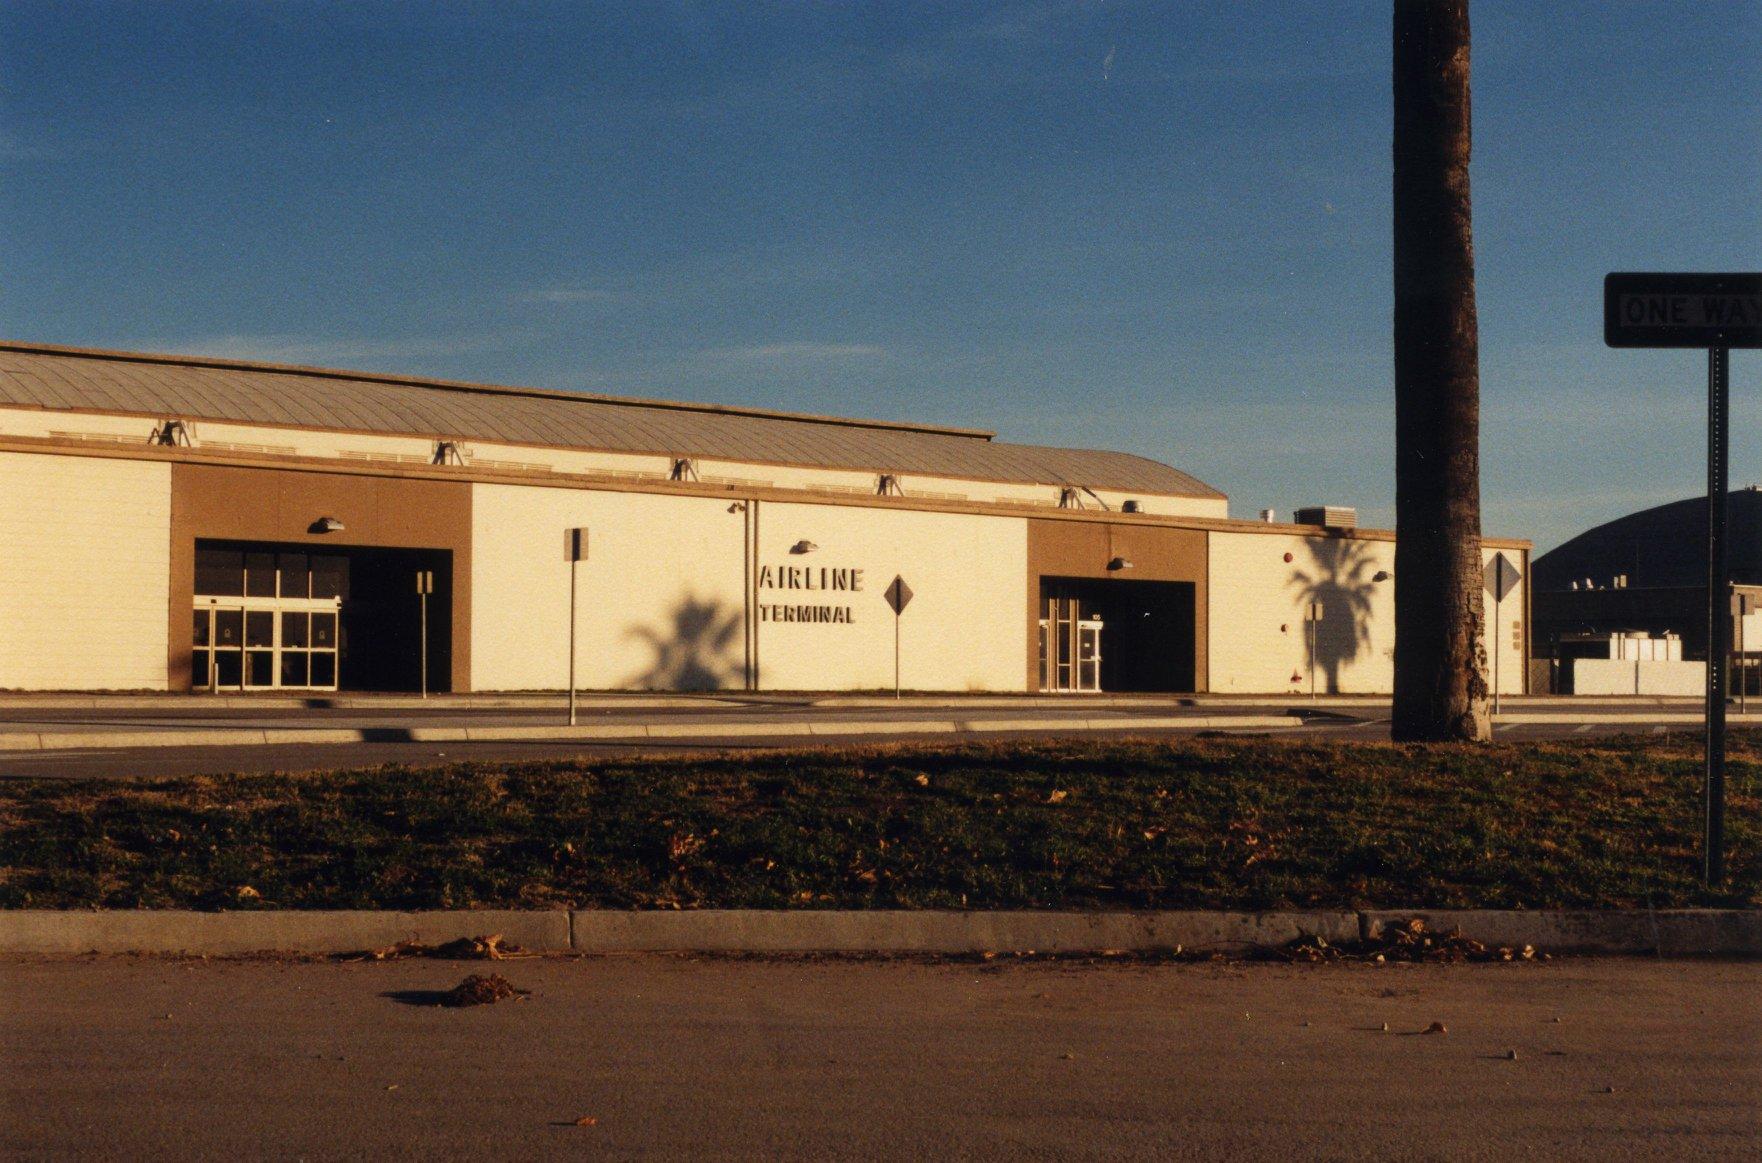 NortonAFB-MAC Passenger Terminal, Bldg